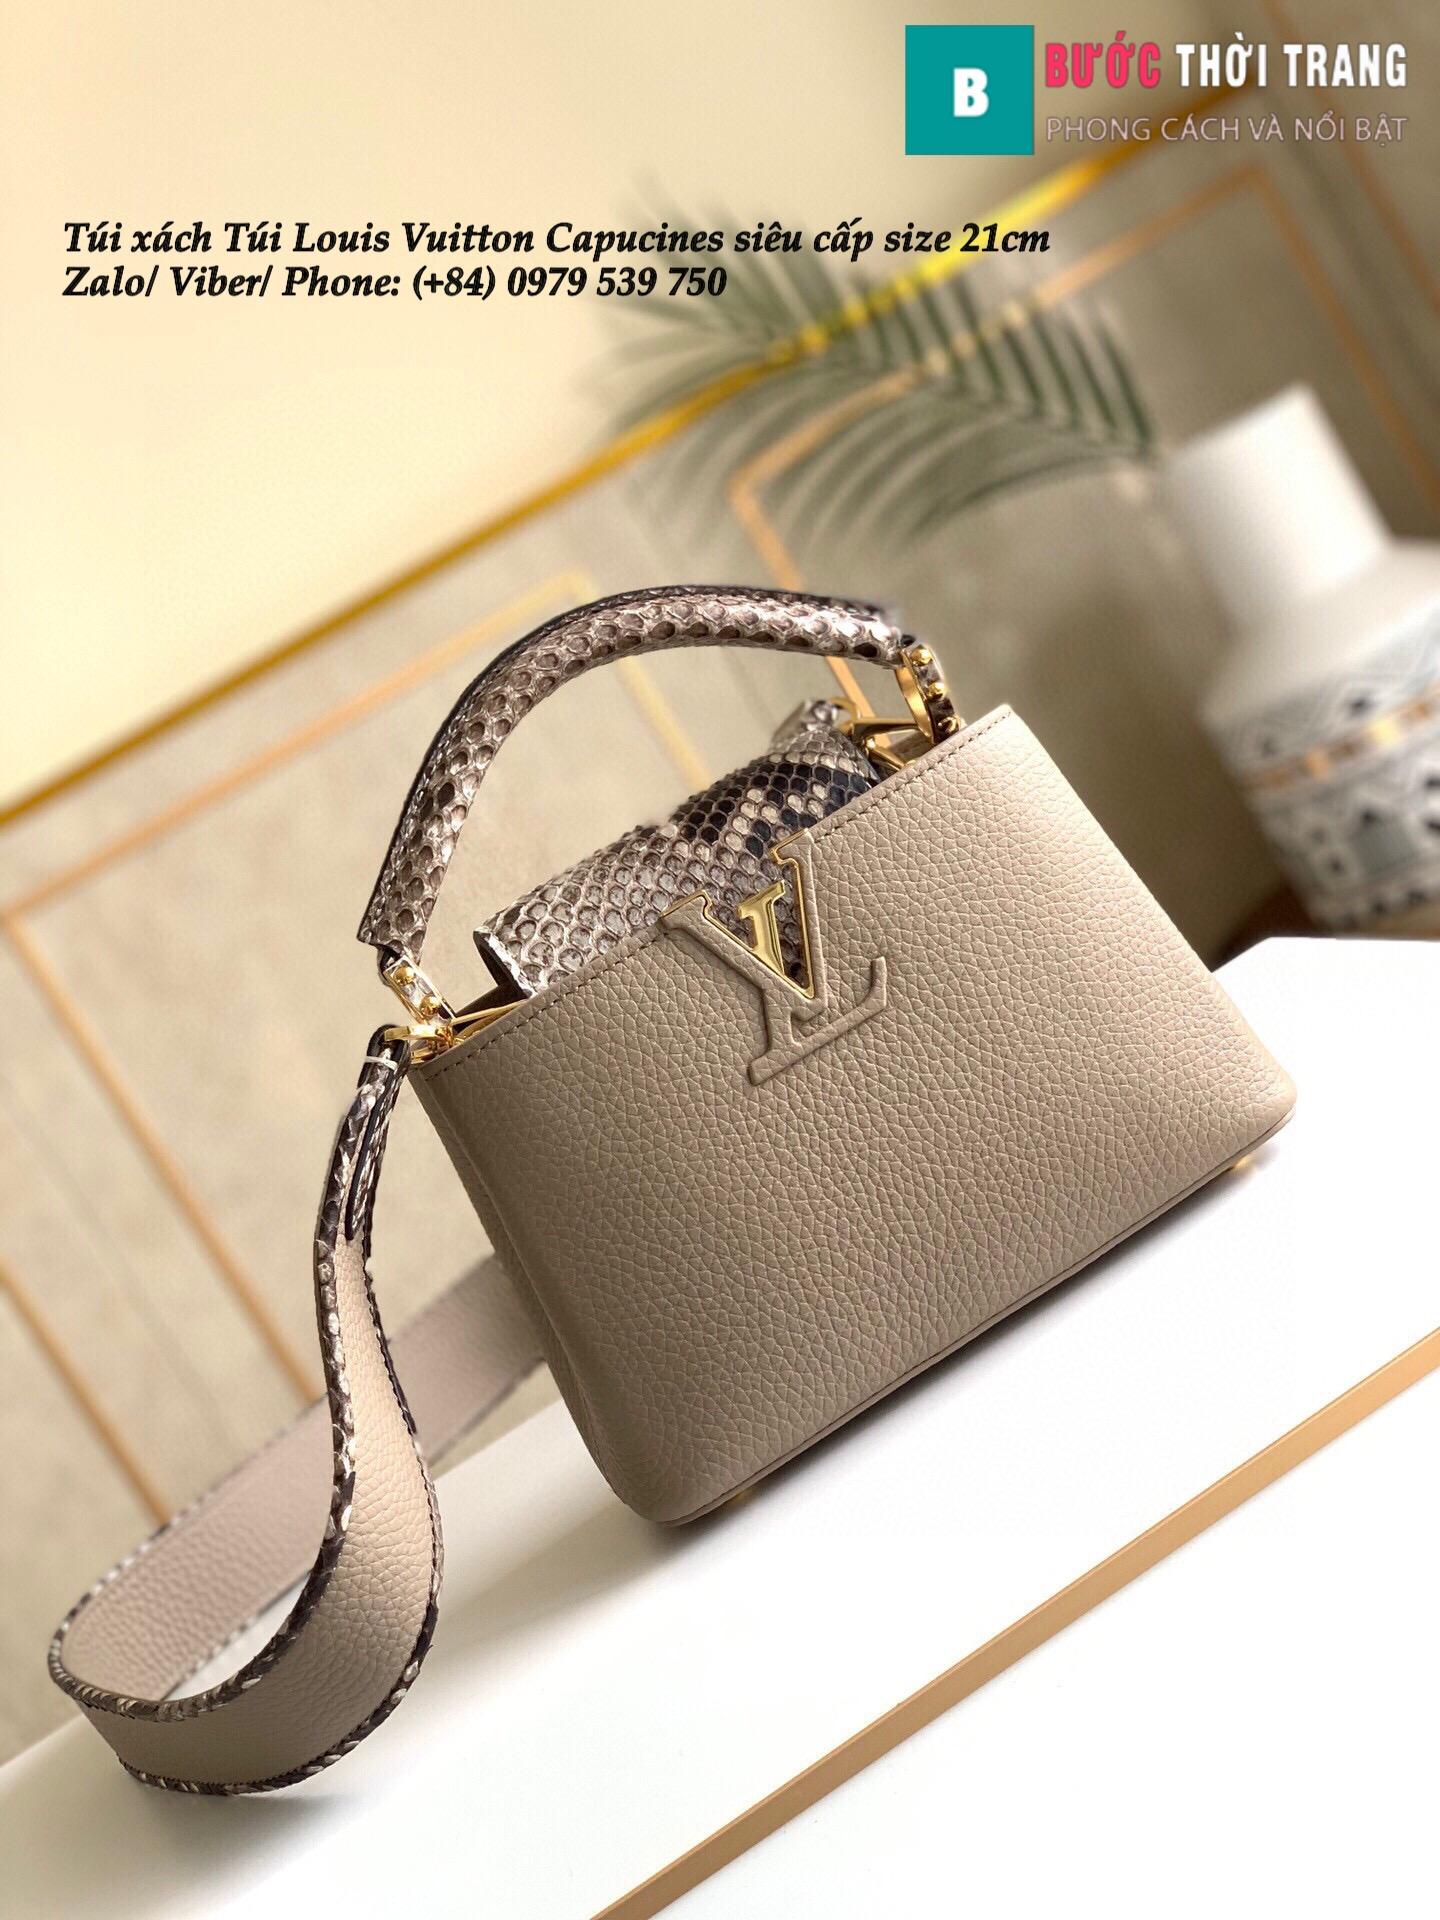 Túi Louis Vuitton Capucines siêu cấp quai da trăn size 21cm – M95509 (19)